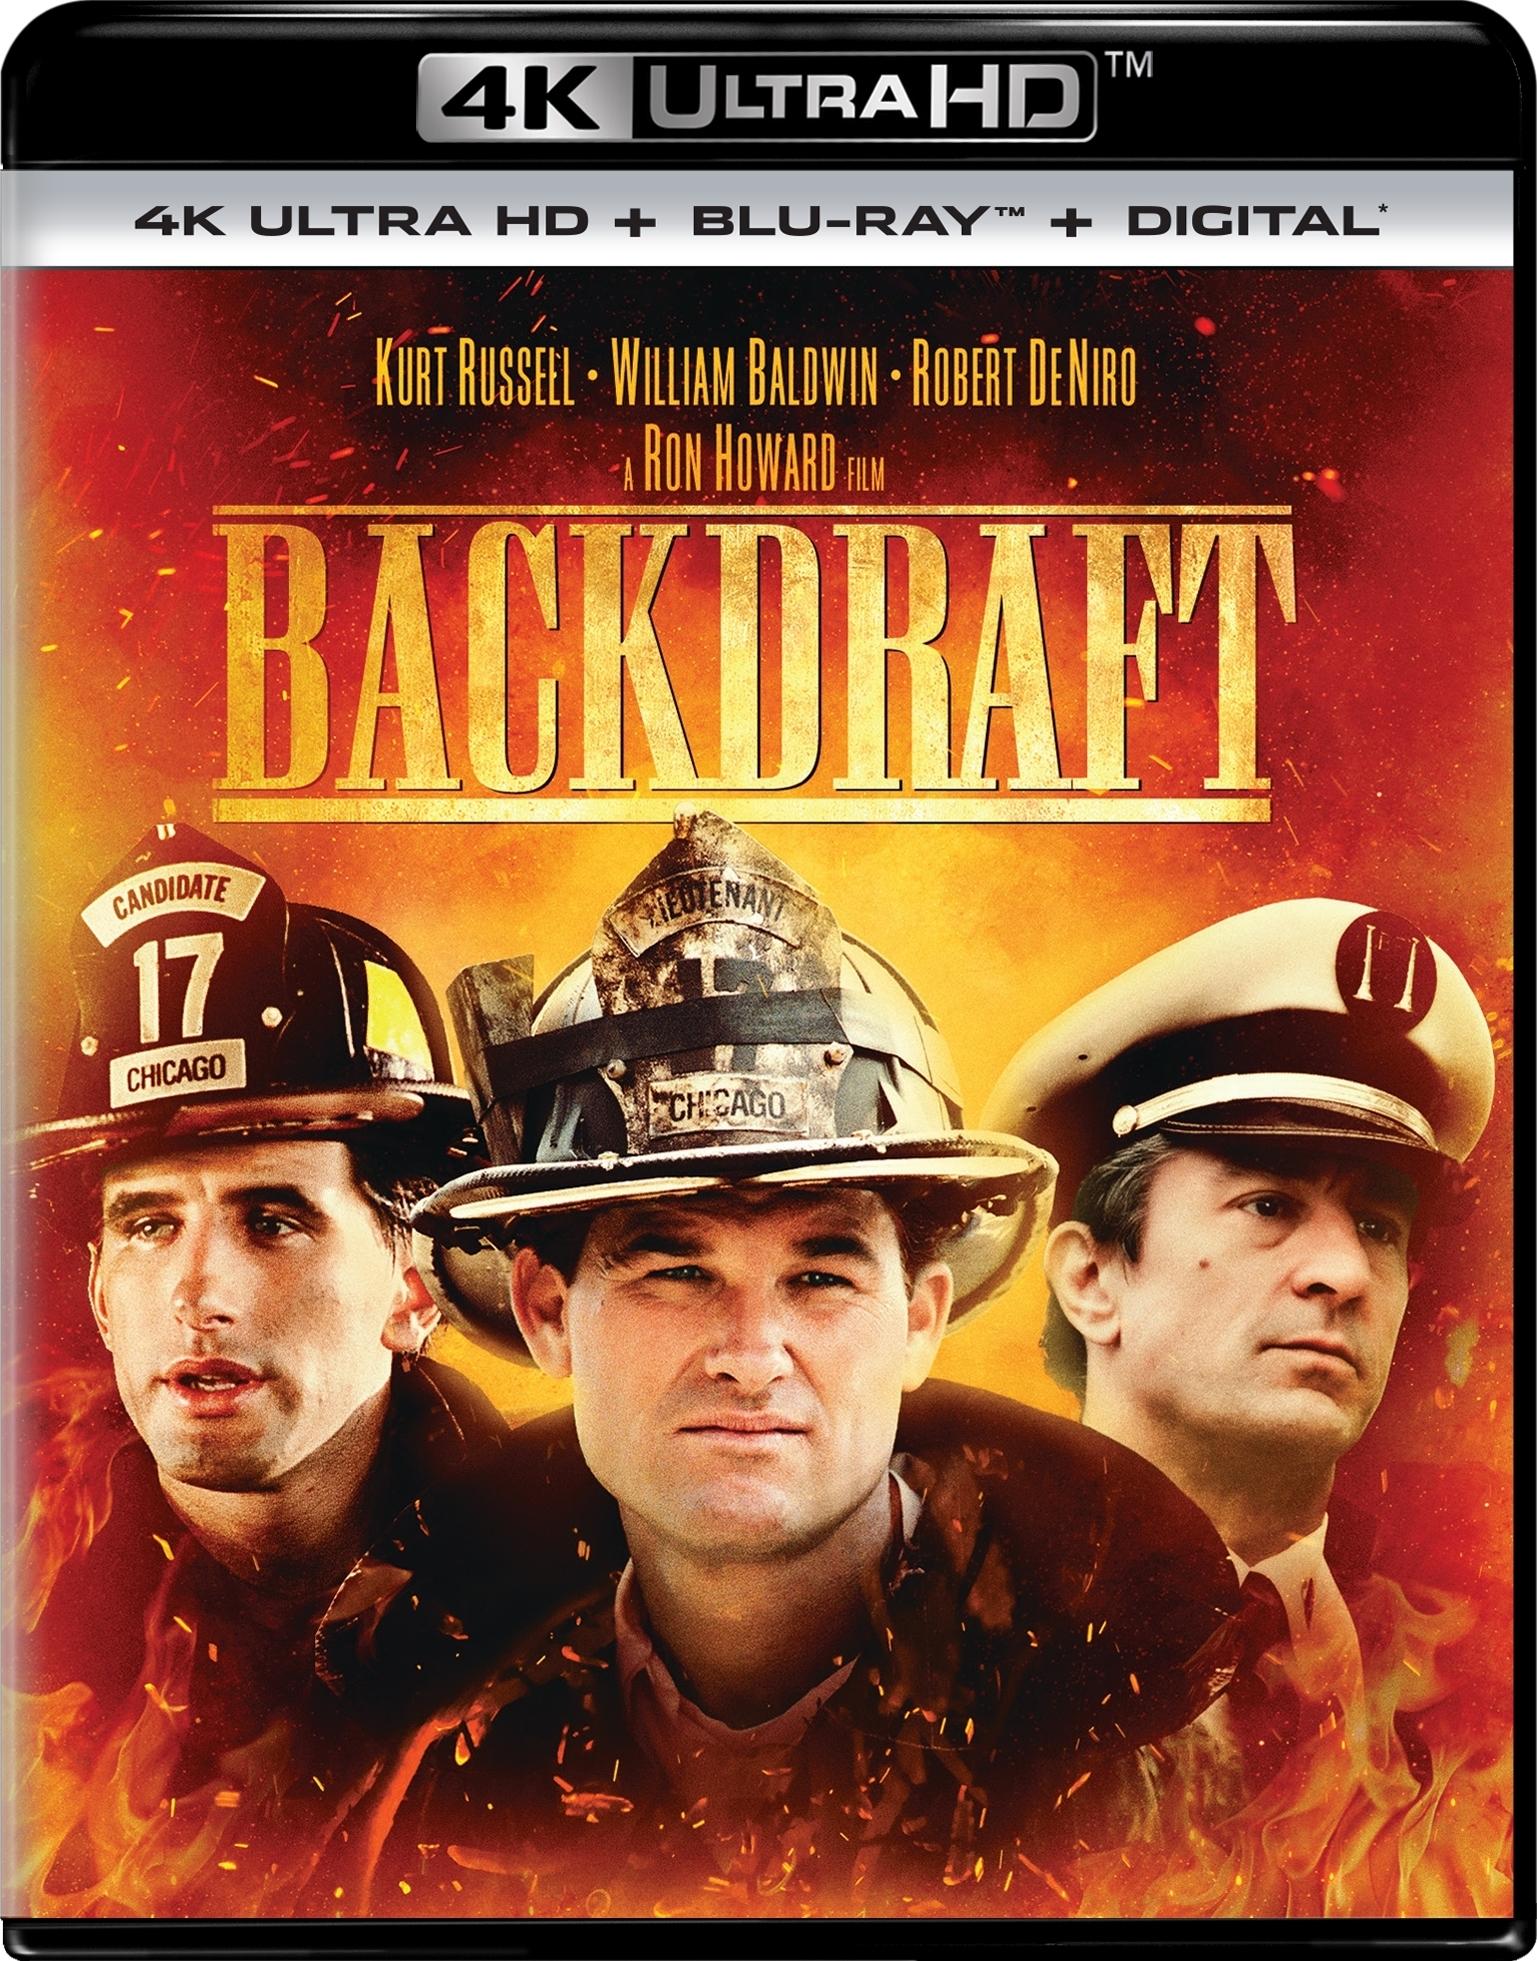 Backdraft (4K Ultra HD Blu-ray)(Pre-order / May 7)